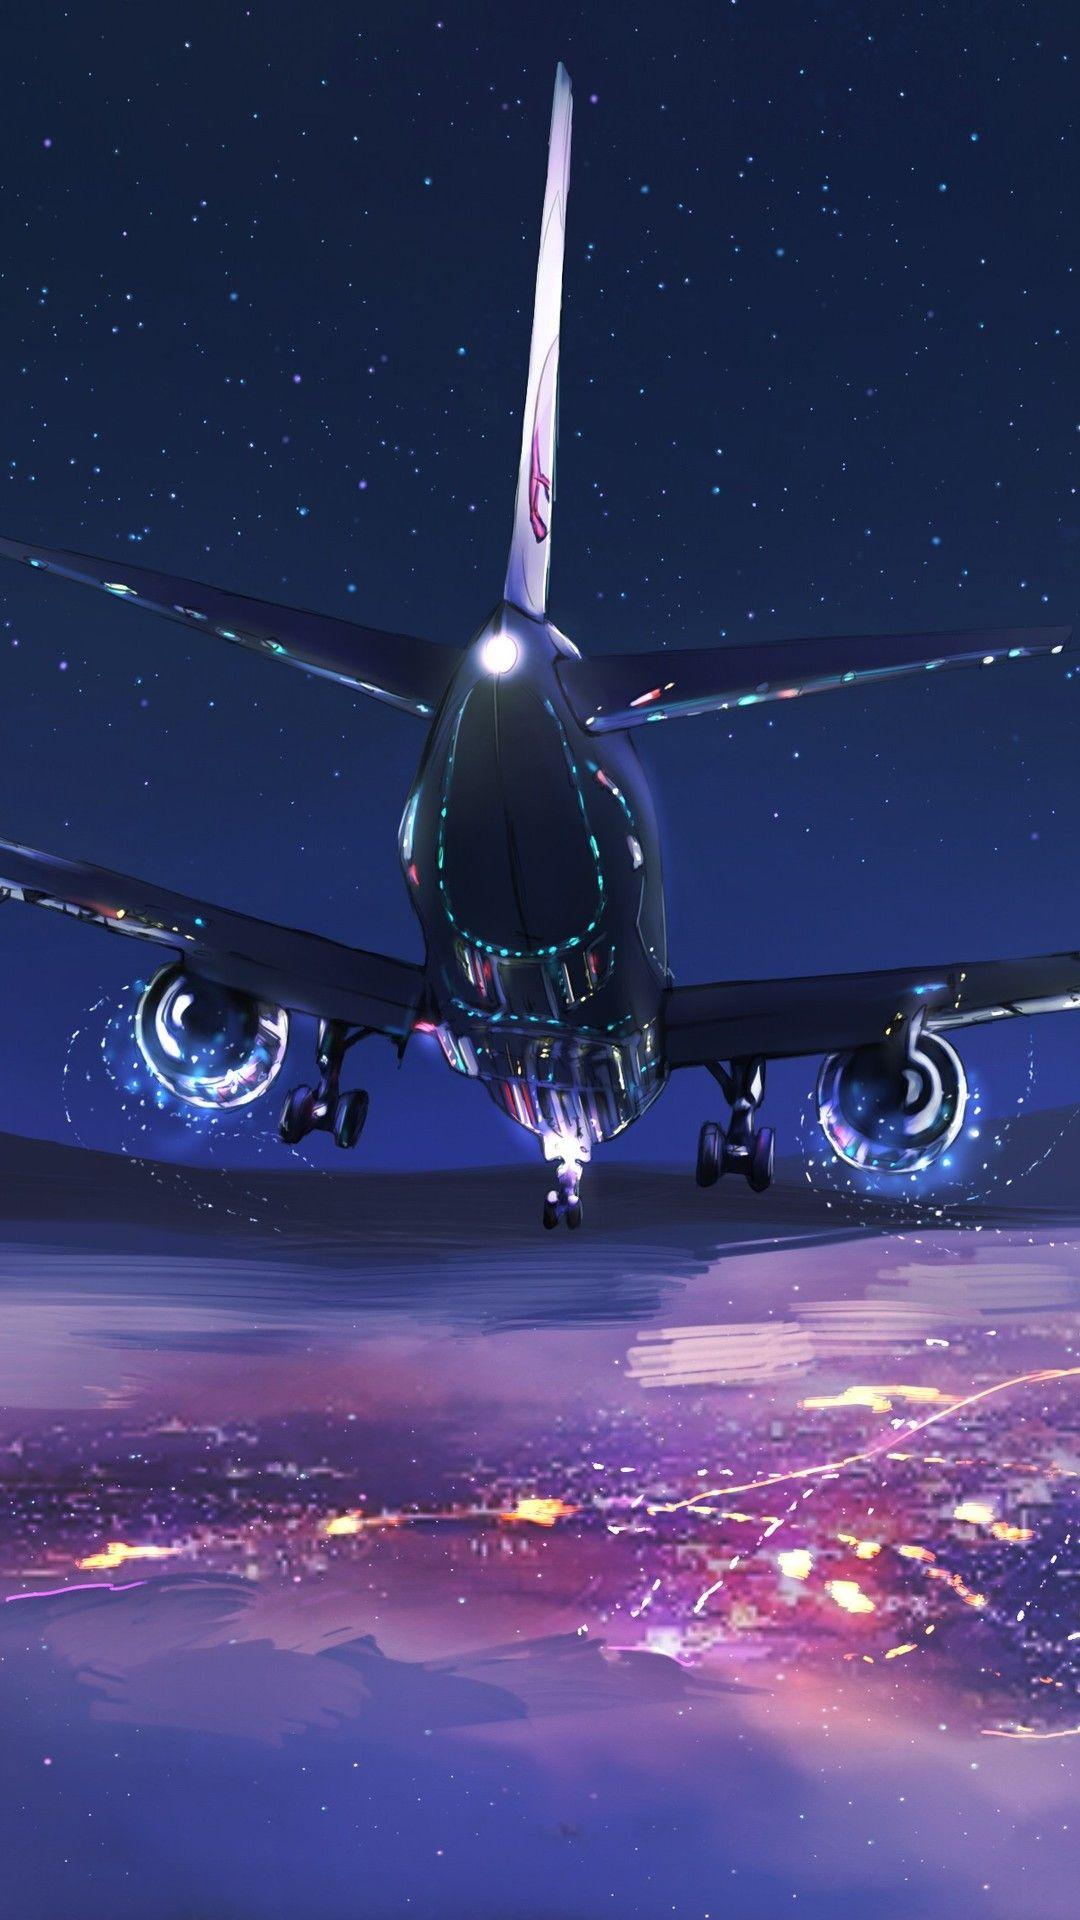 Boeing 737 Next Generation Planes Minimalism Photography